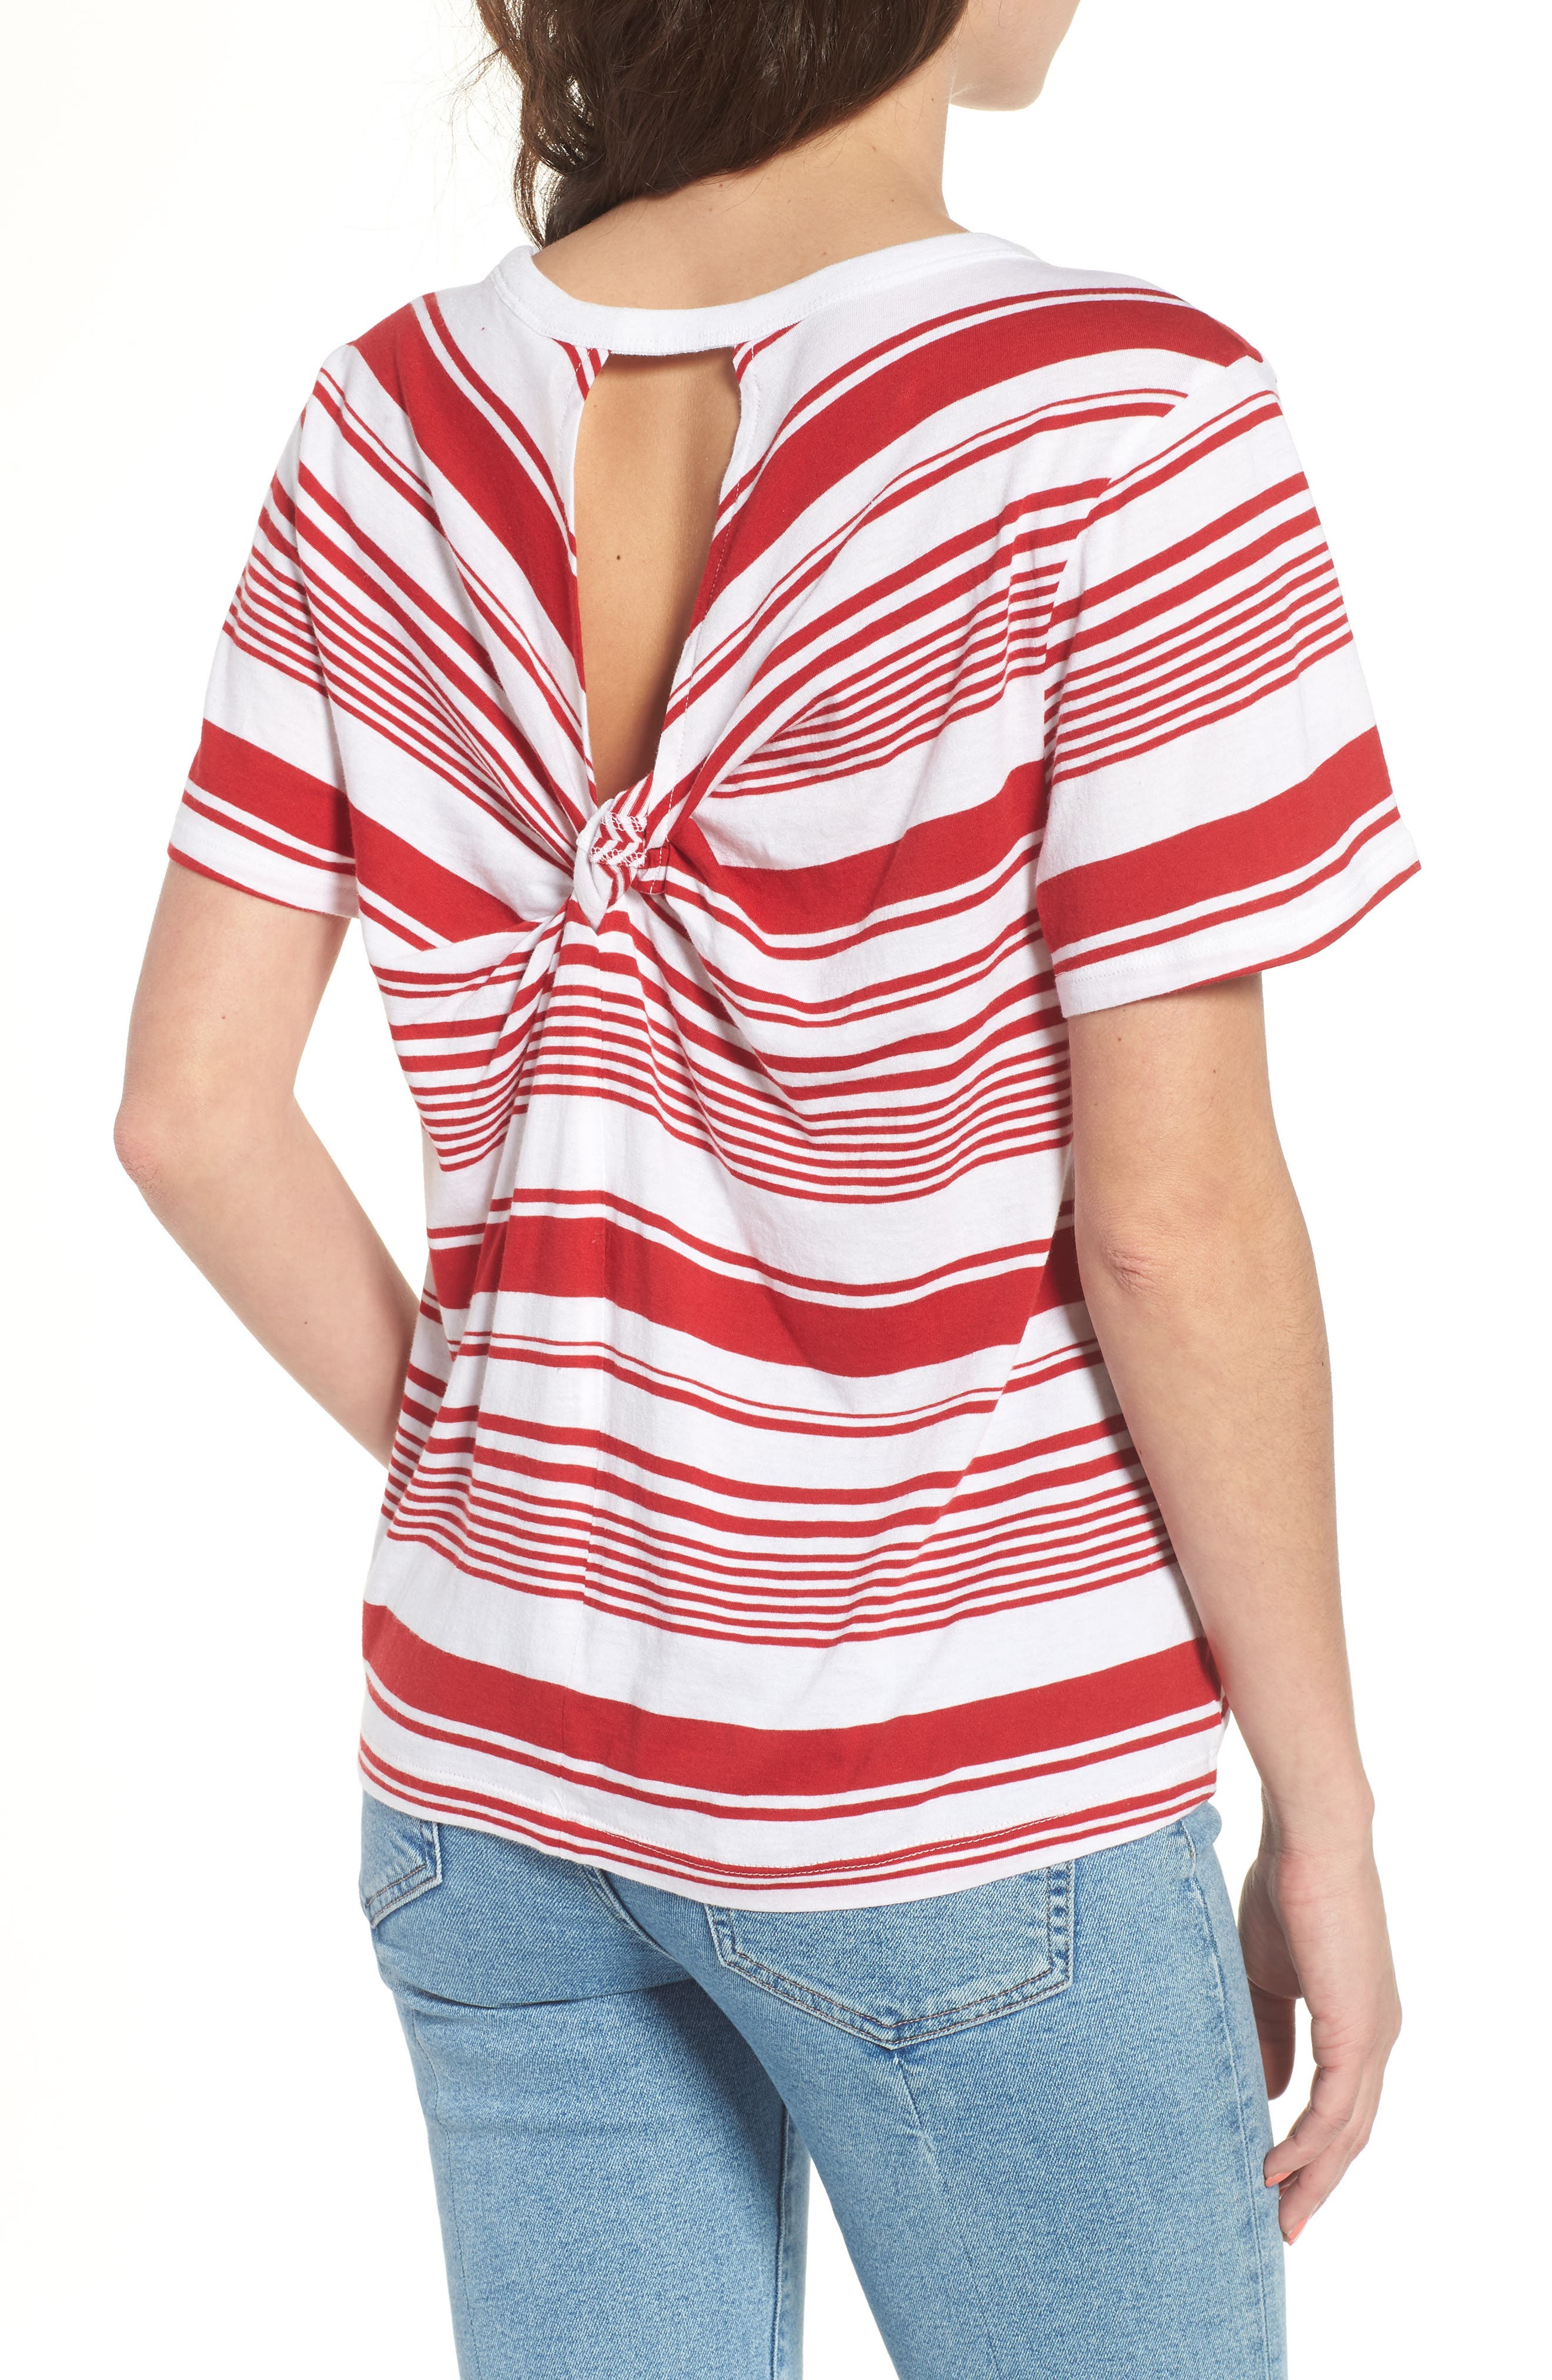 Twist Back Tee,                             Alternate thumbnail 2, color,                             Red Couture Monaco Stripe